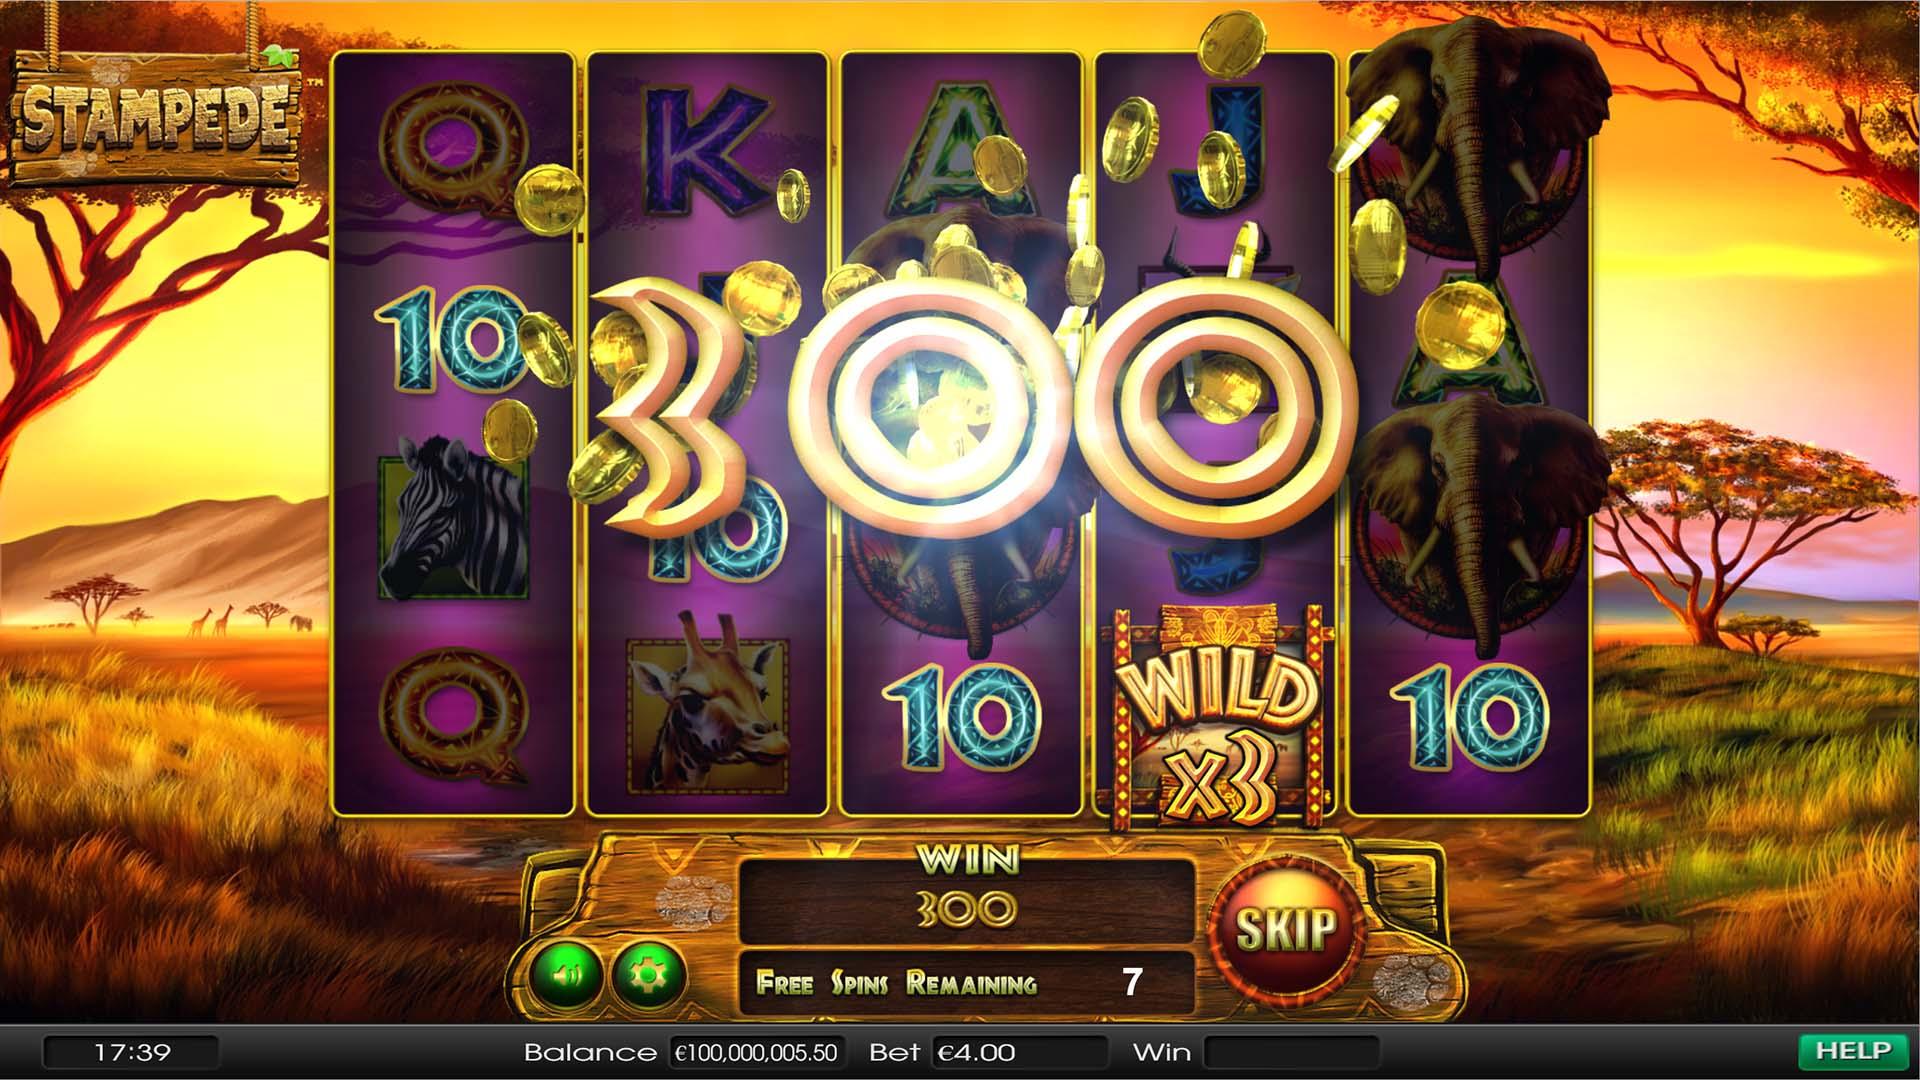 Stampede Slots Online